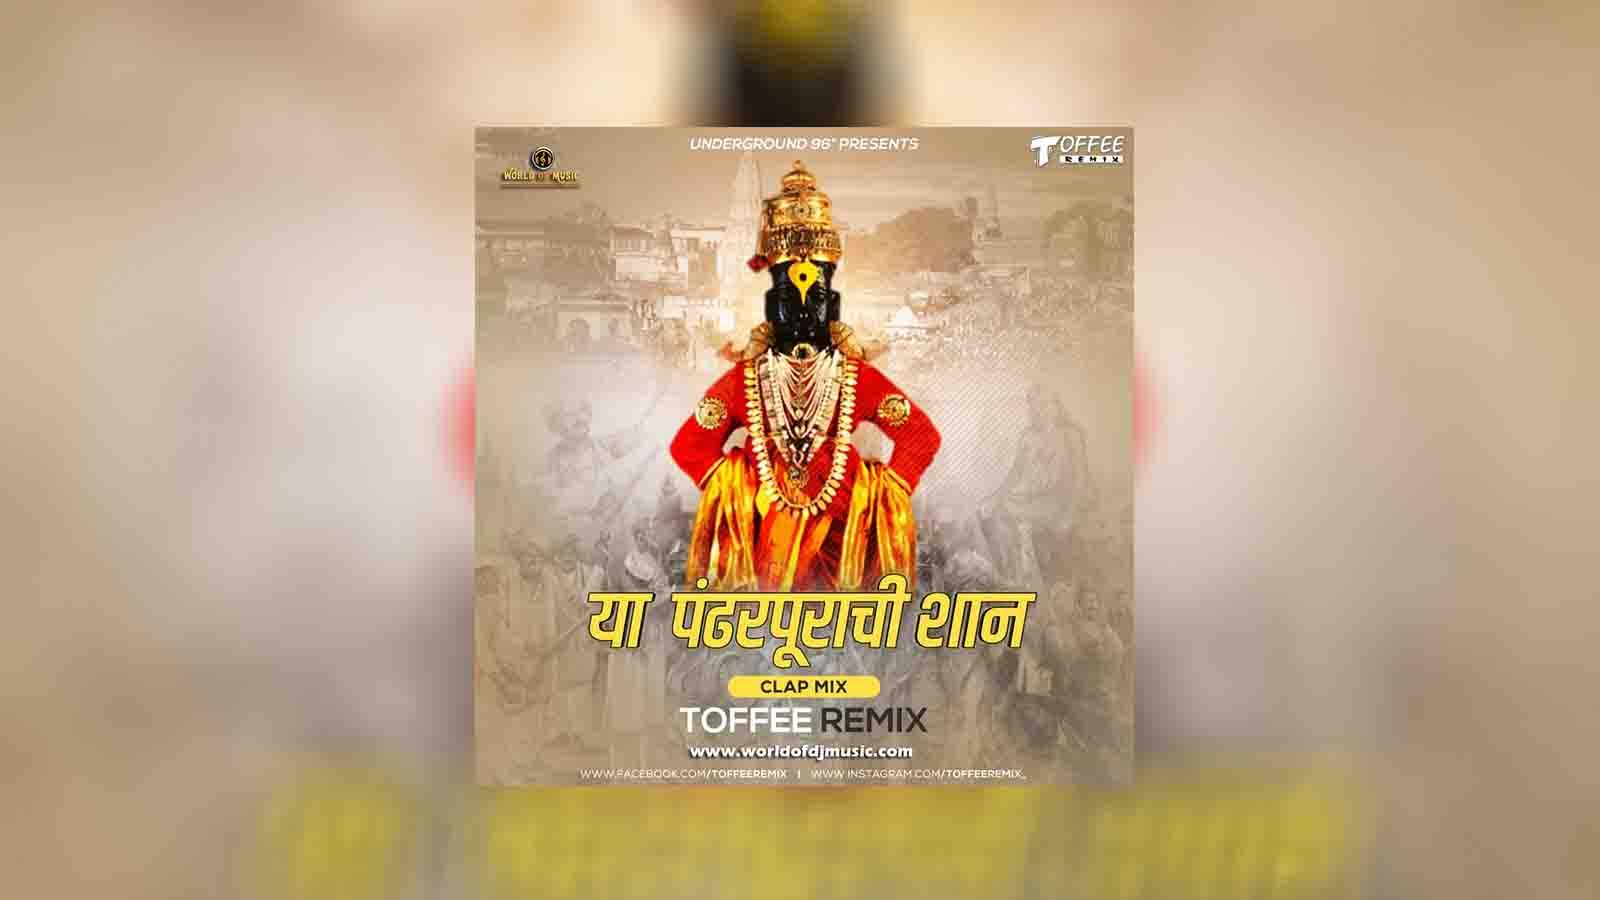 Ya Pandharpurachi Shan - Clap Mix - Toffee Remix